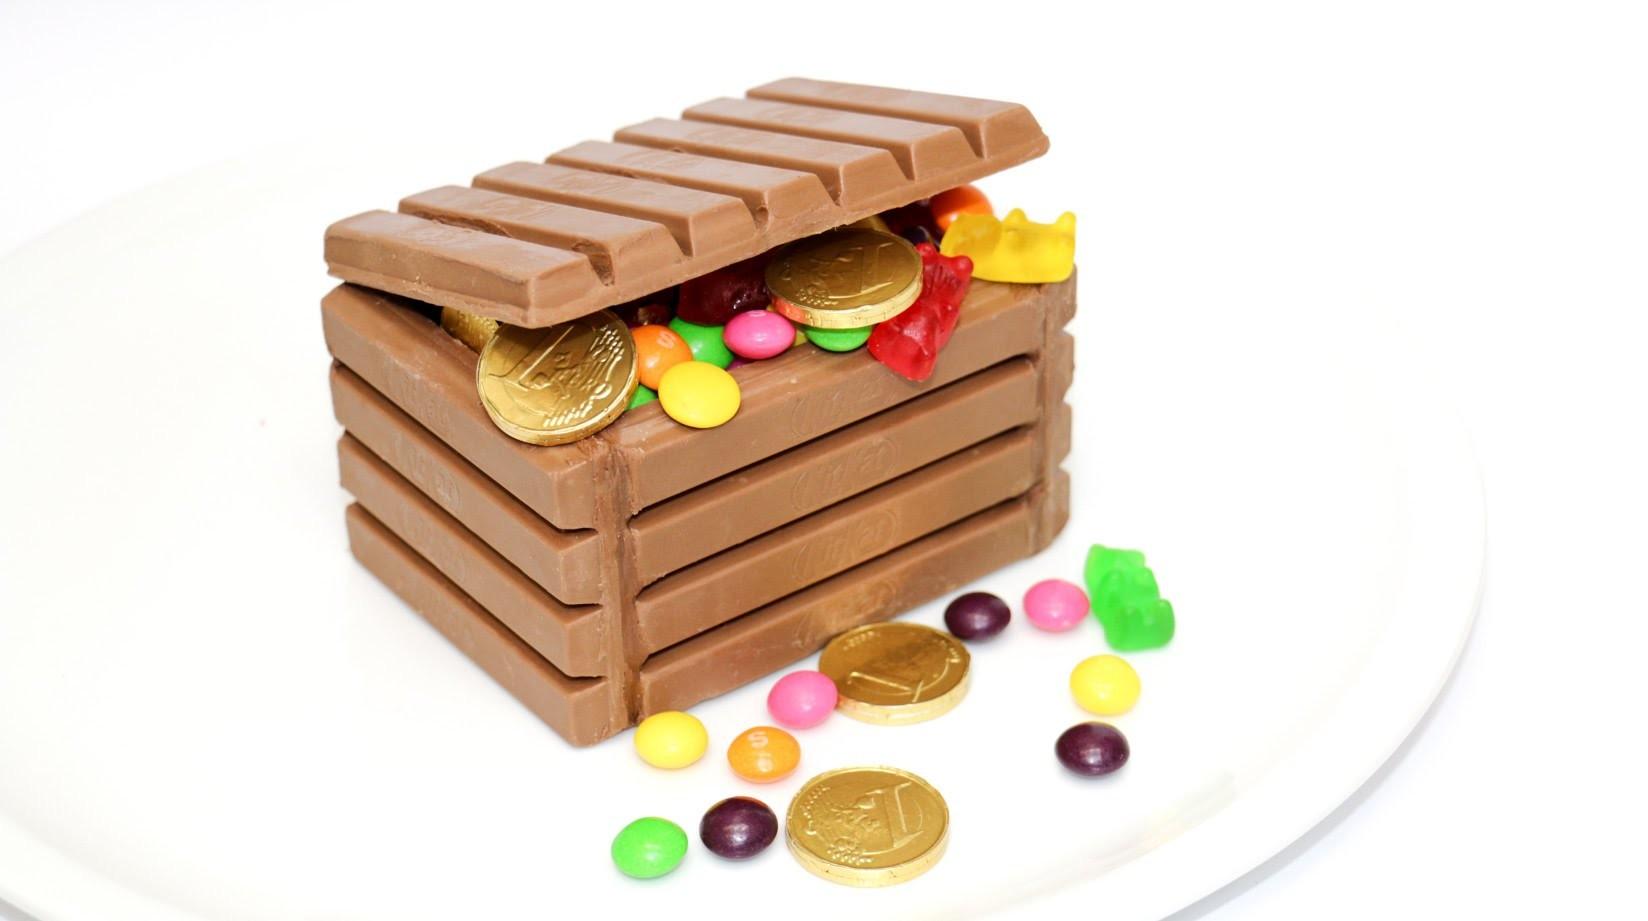 DIY - KIT KAT Chocolate Candy Chest